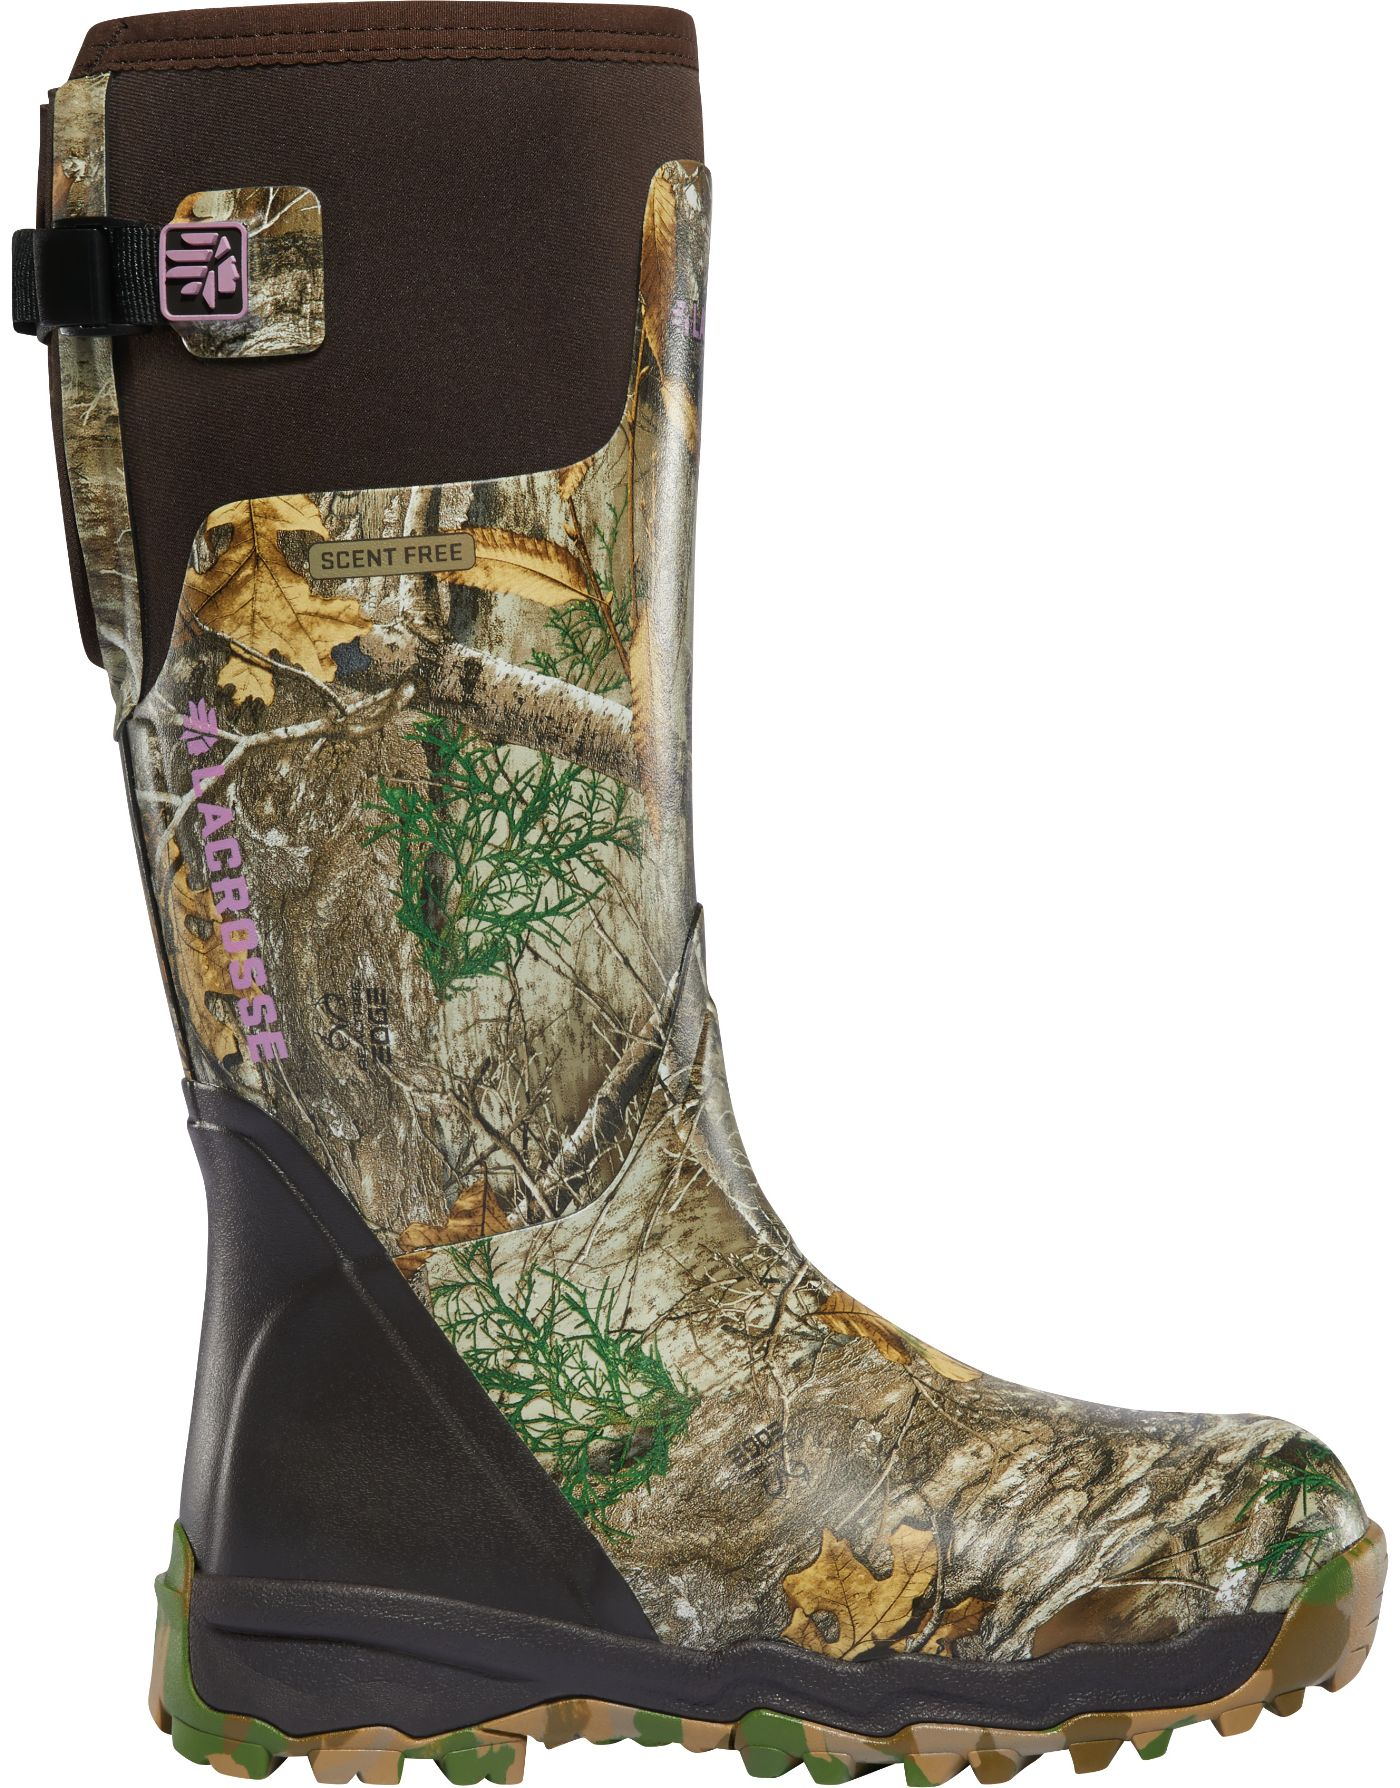 LaCrosse Women's Alphaburly Pro 15'' Realtree Edge Rubber Hunting Boots